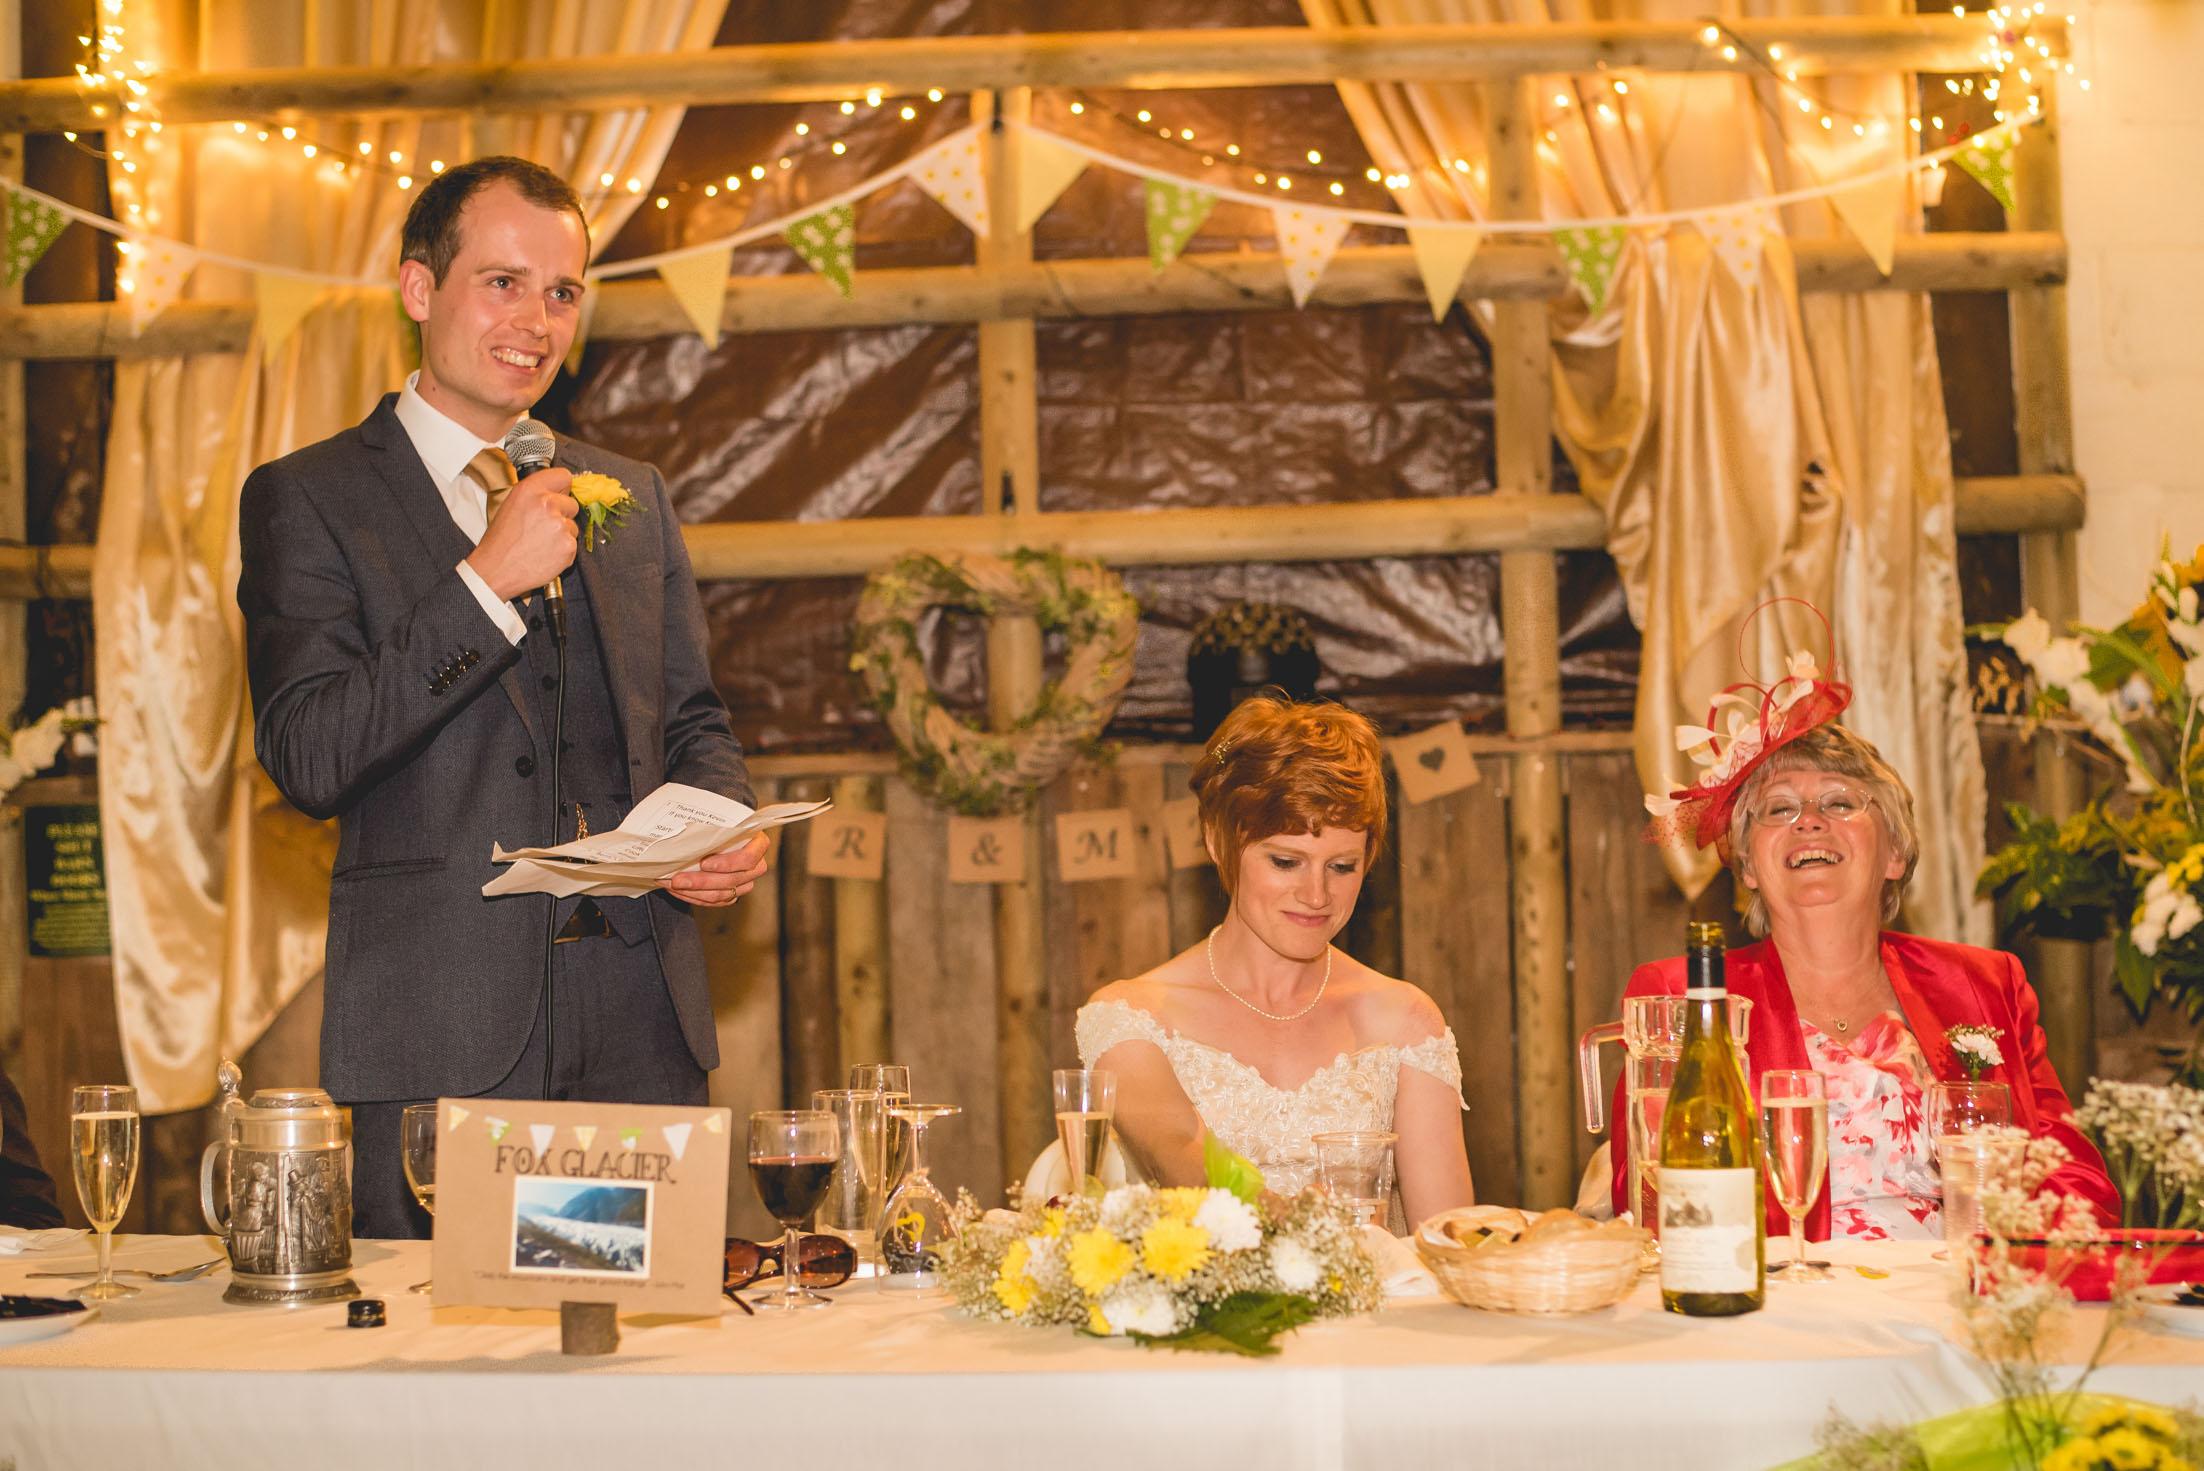 Peak+district+farm+wedding+lower+damgate+photographer-222.jpg